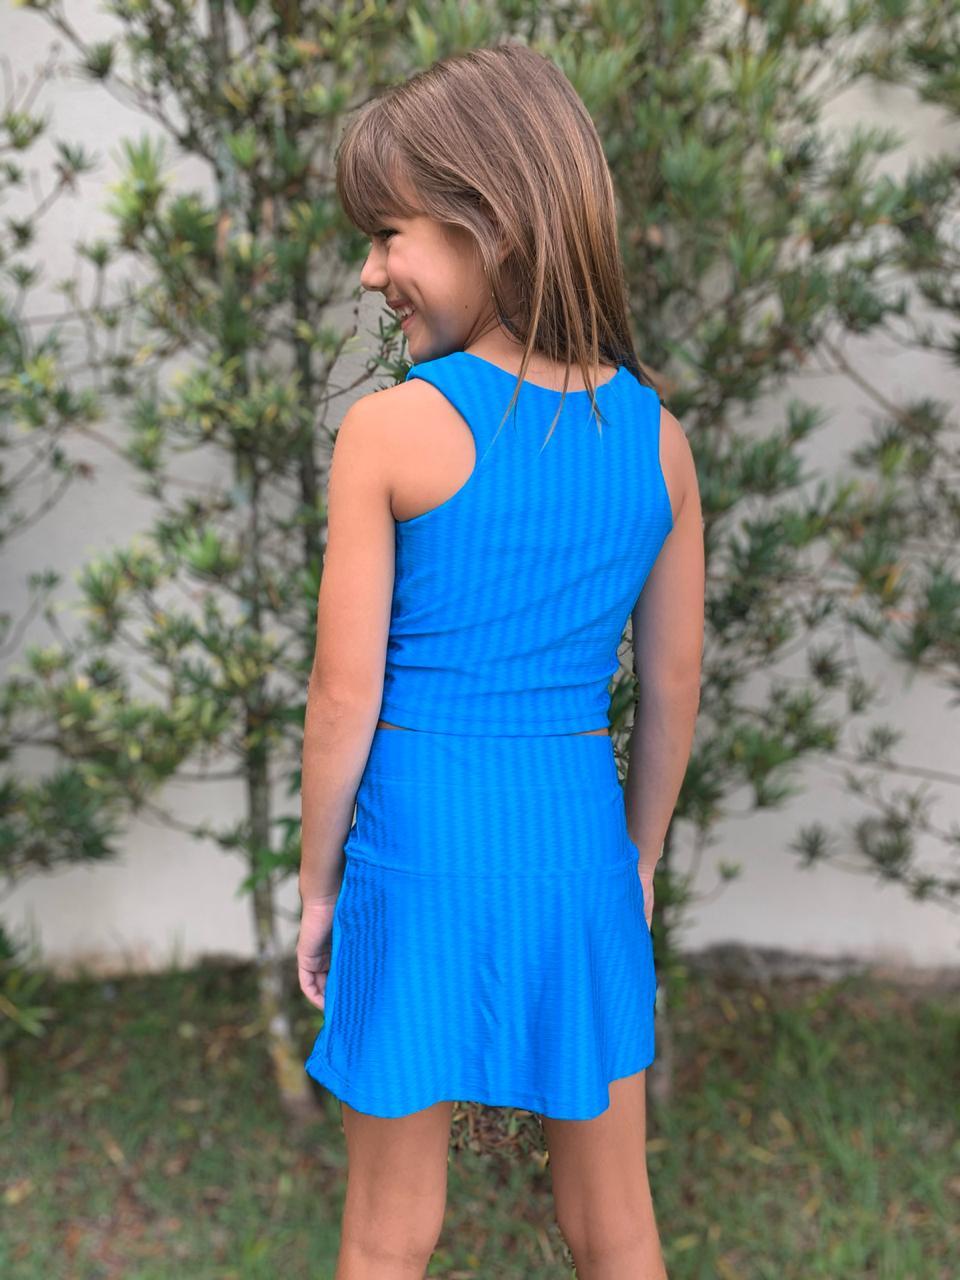 Shorts Saia Infantil Azul Turquesa